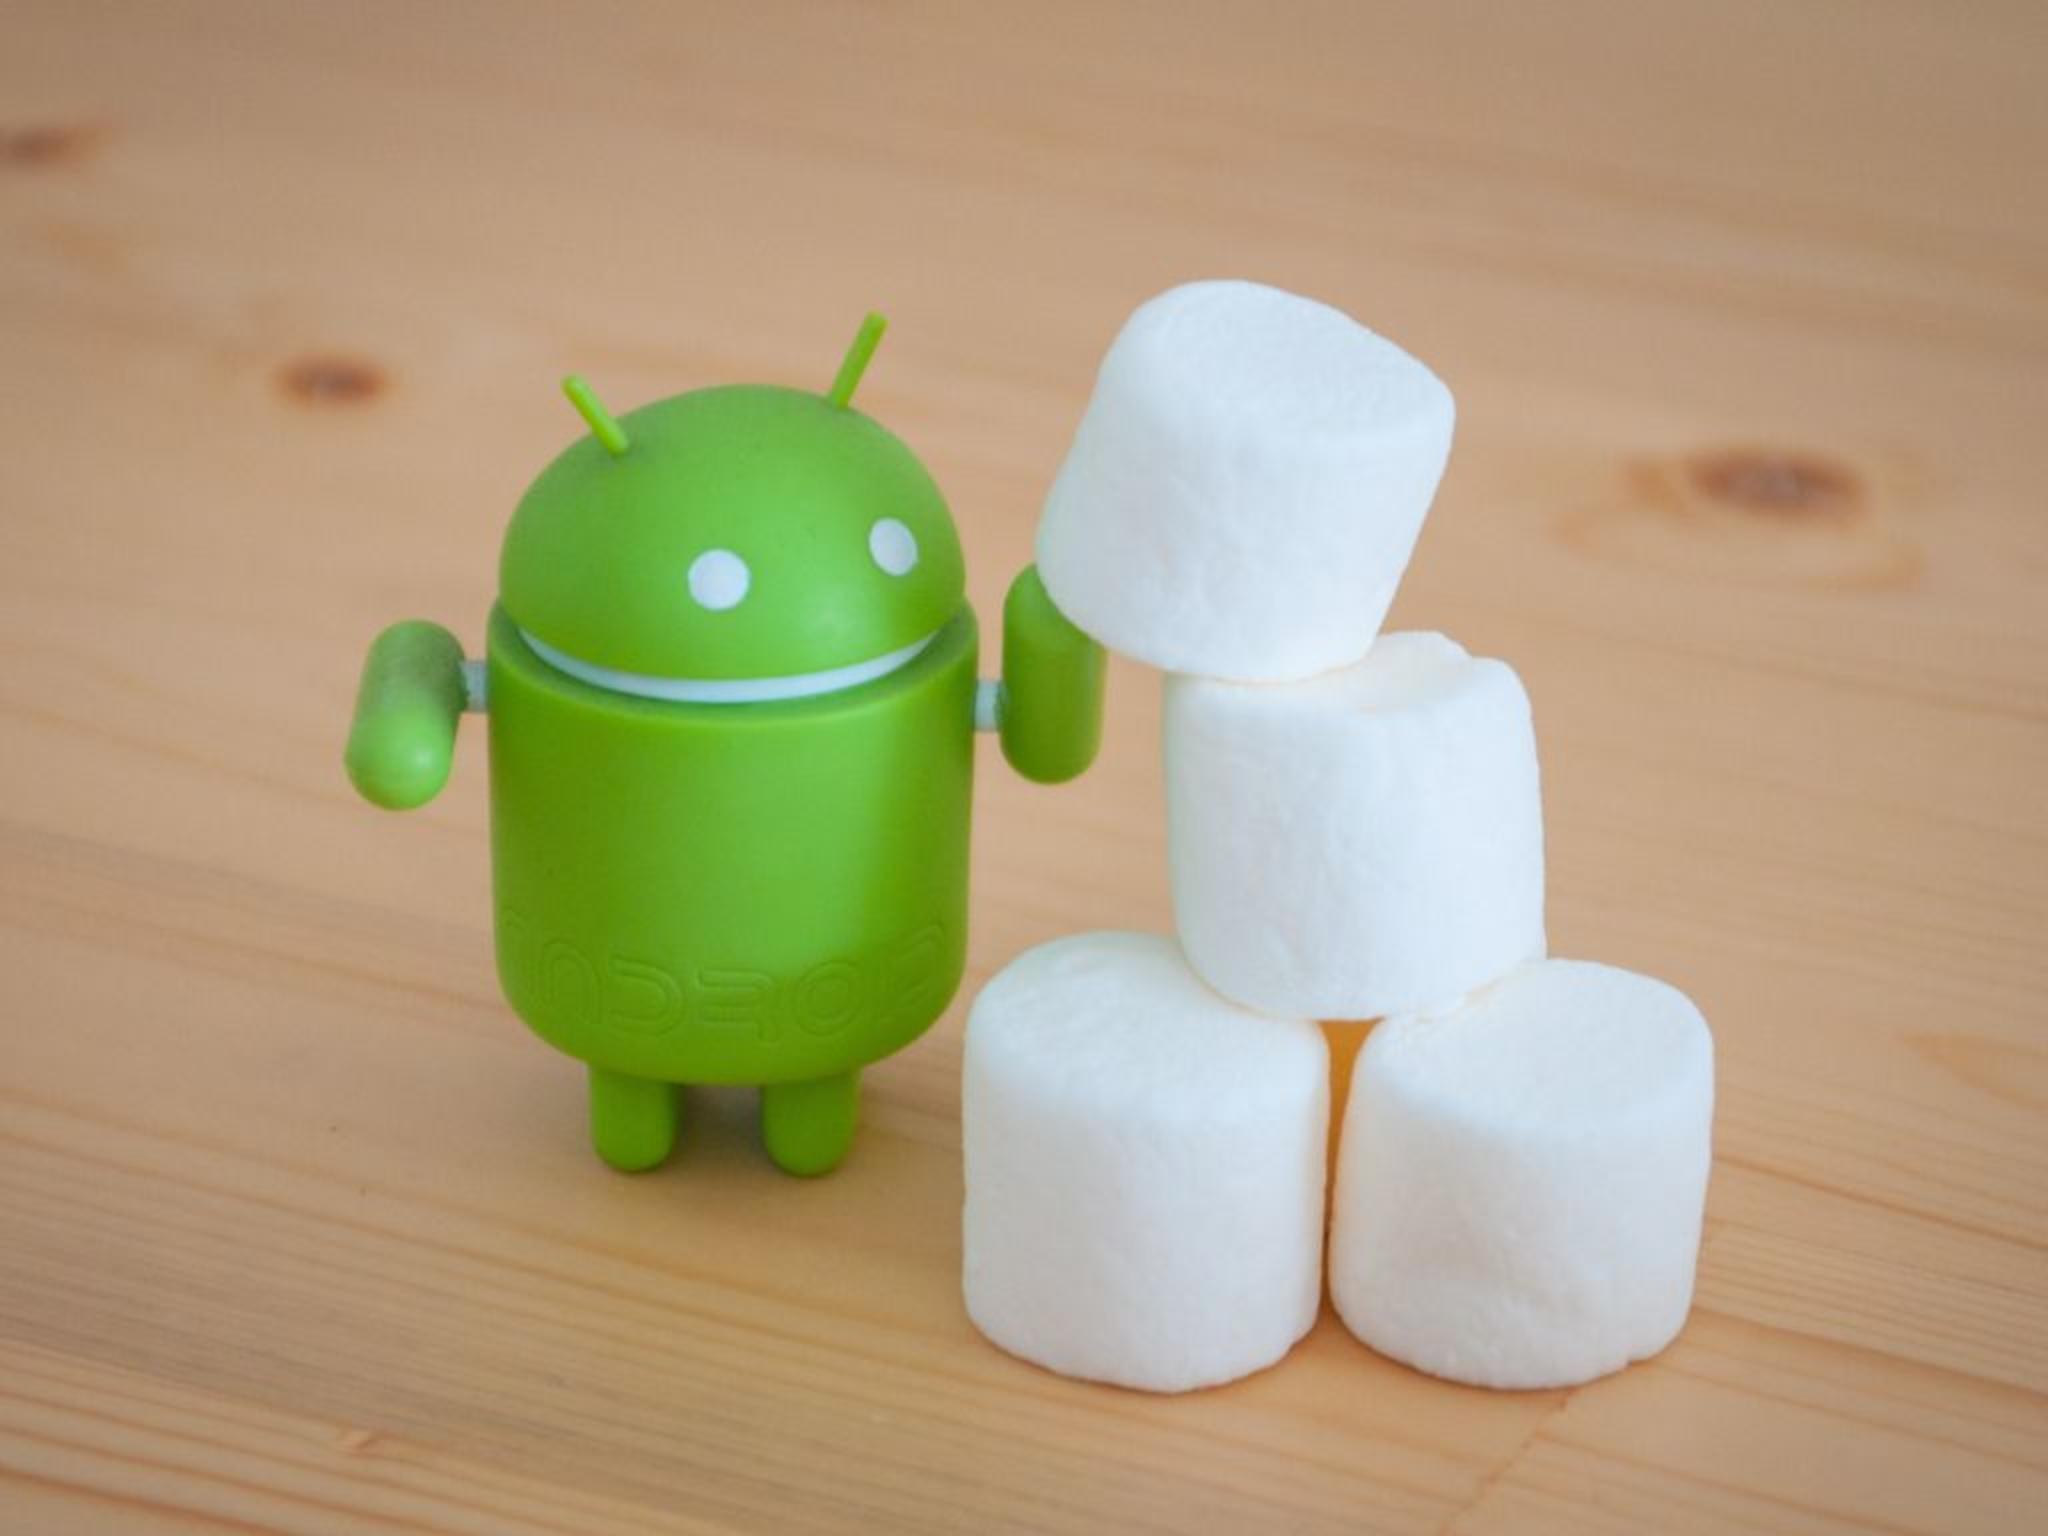 Android 6.0 Marshmallow kommt am 5. Oktober.